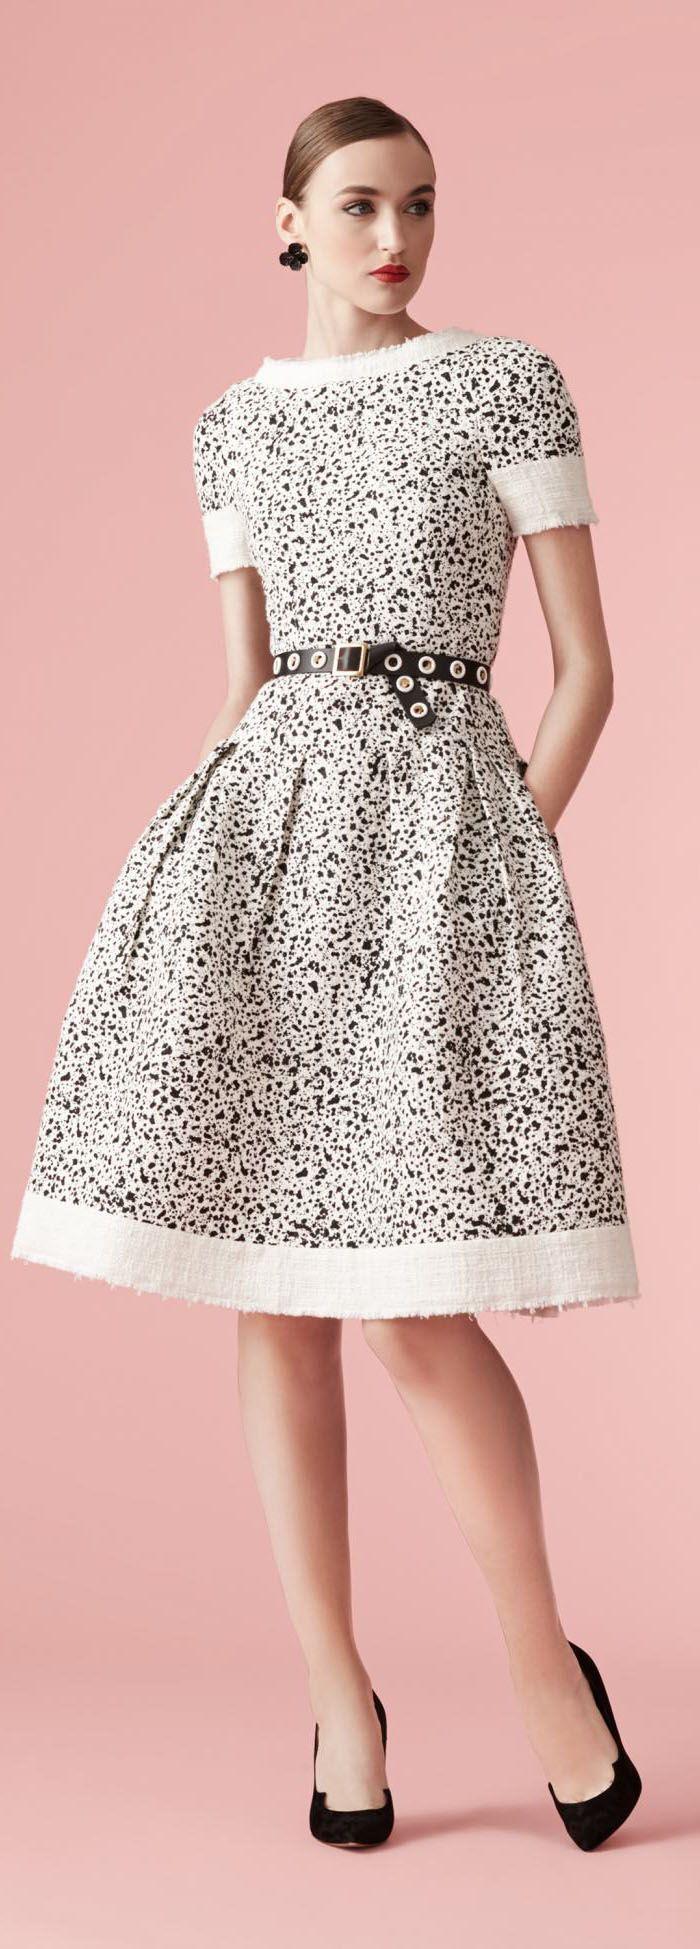 Carolina Herrera women fashion outfit clothing style apparel ...